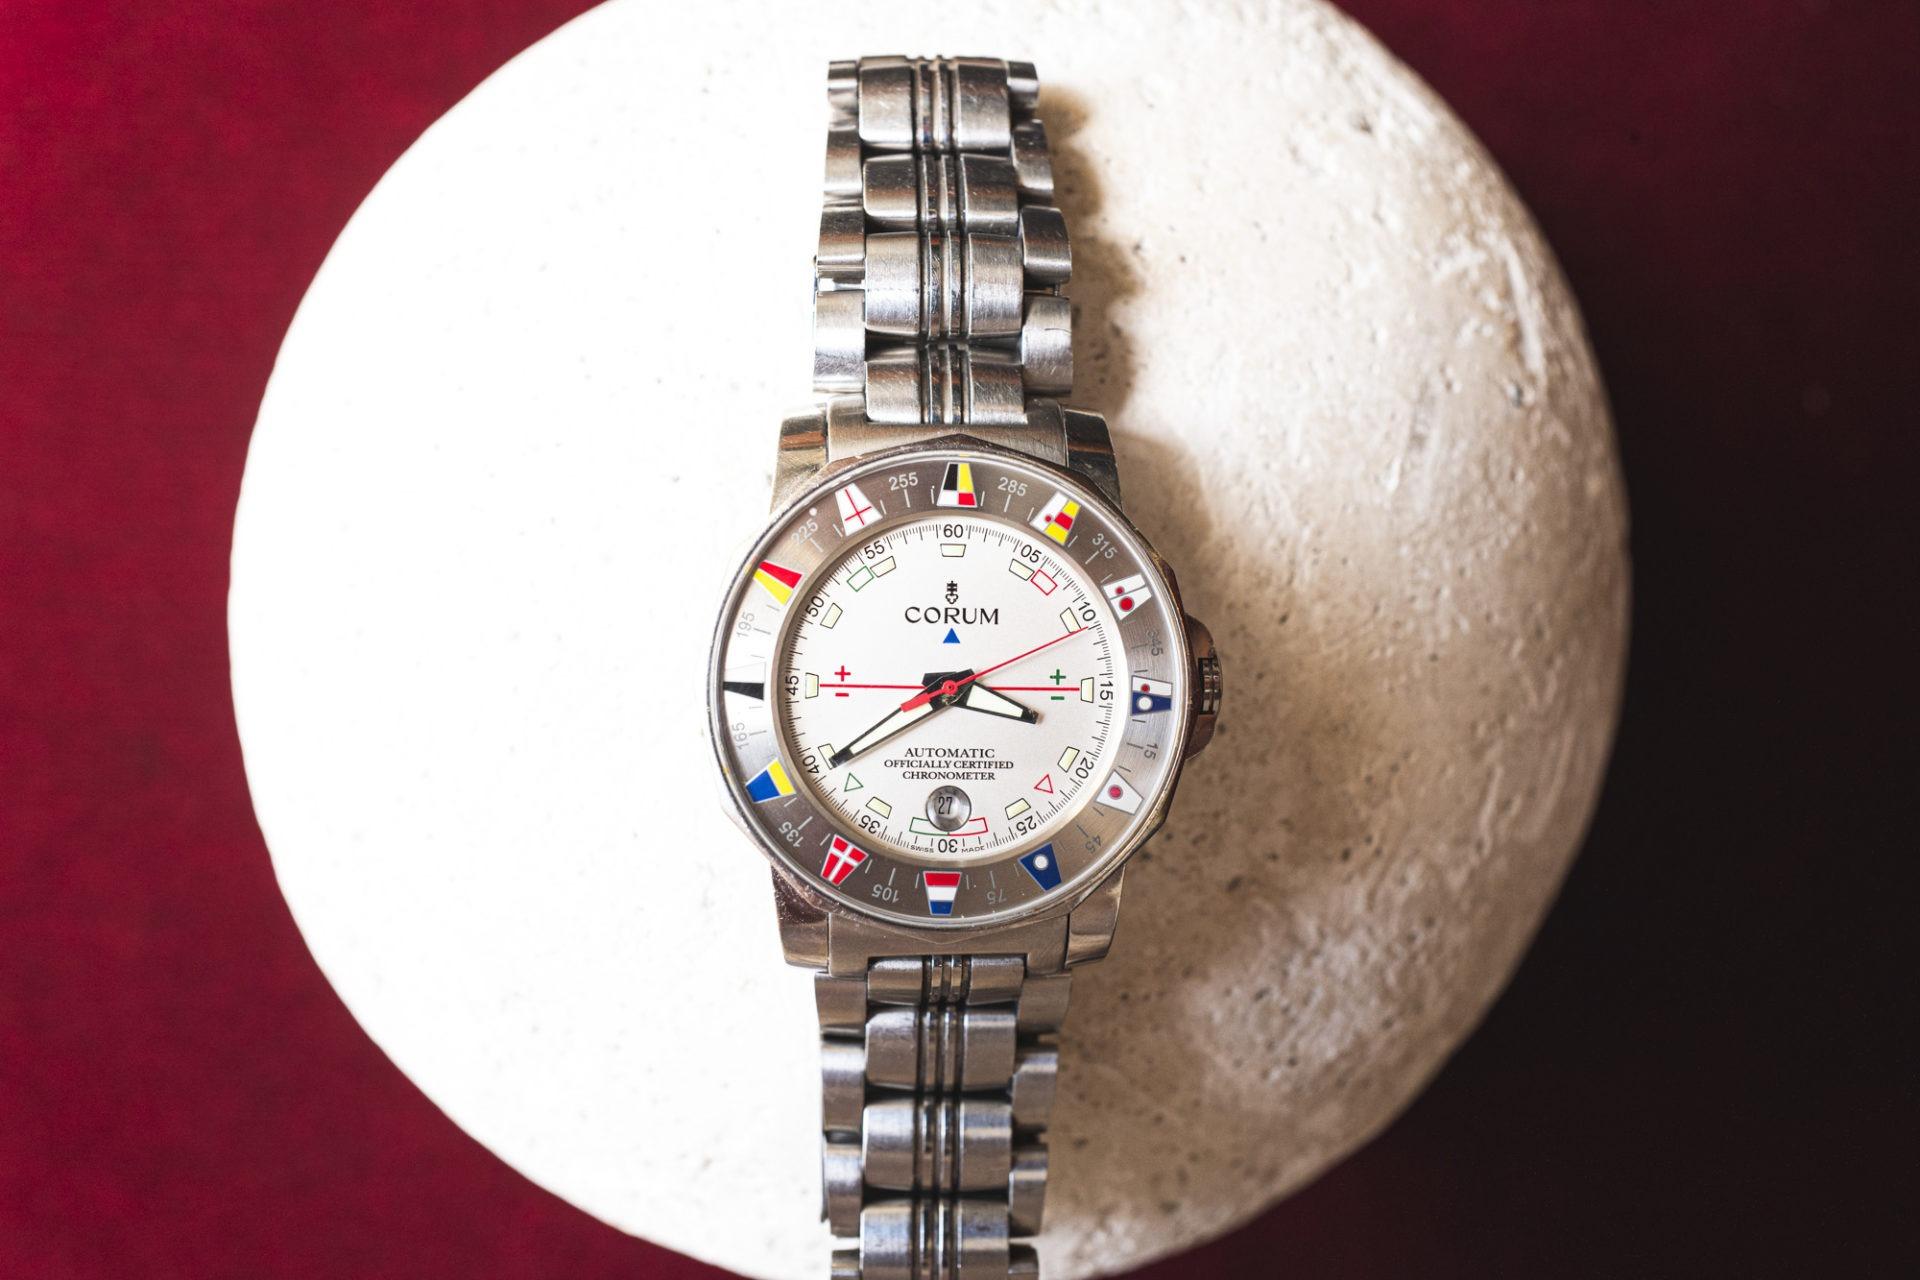 Corum Admiral's Cup - Vente importante de montres de collection par Tajan le 2 juillet